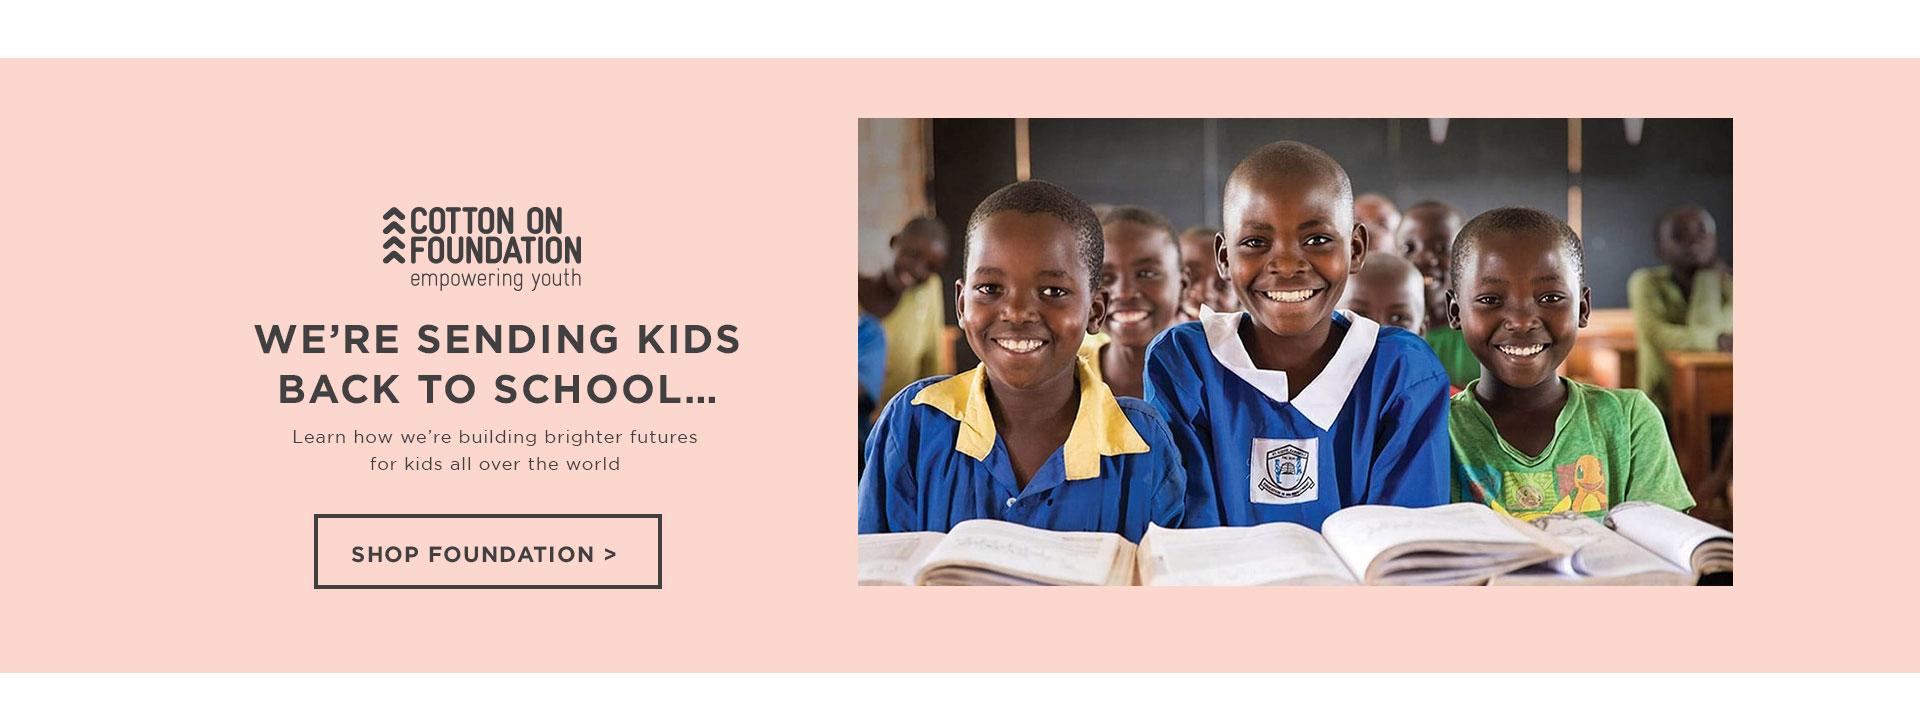 We're sending kids to school. Shop Foundation.